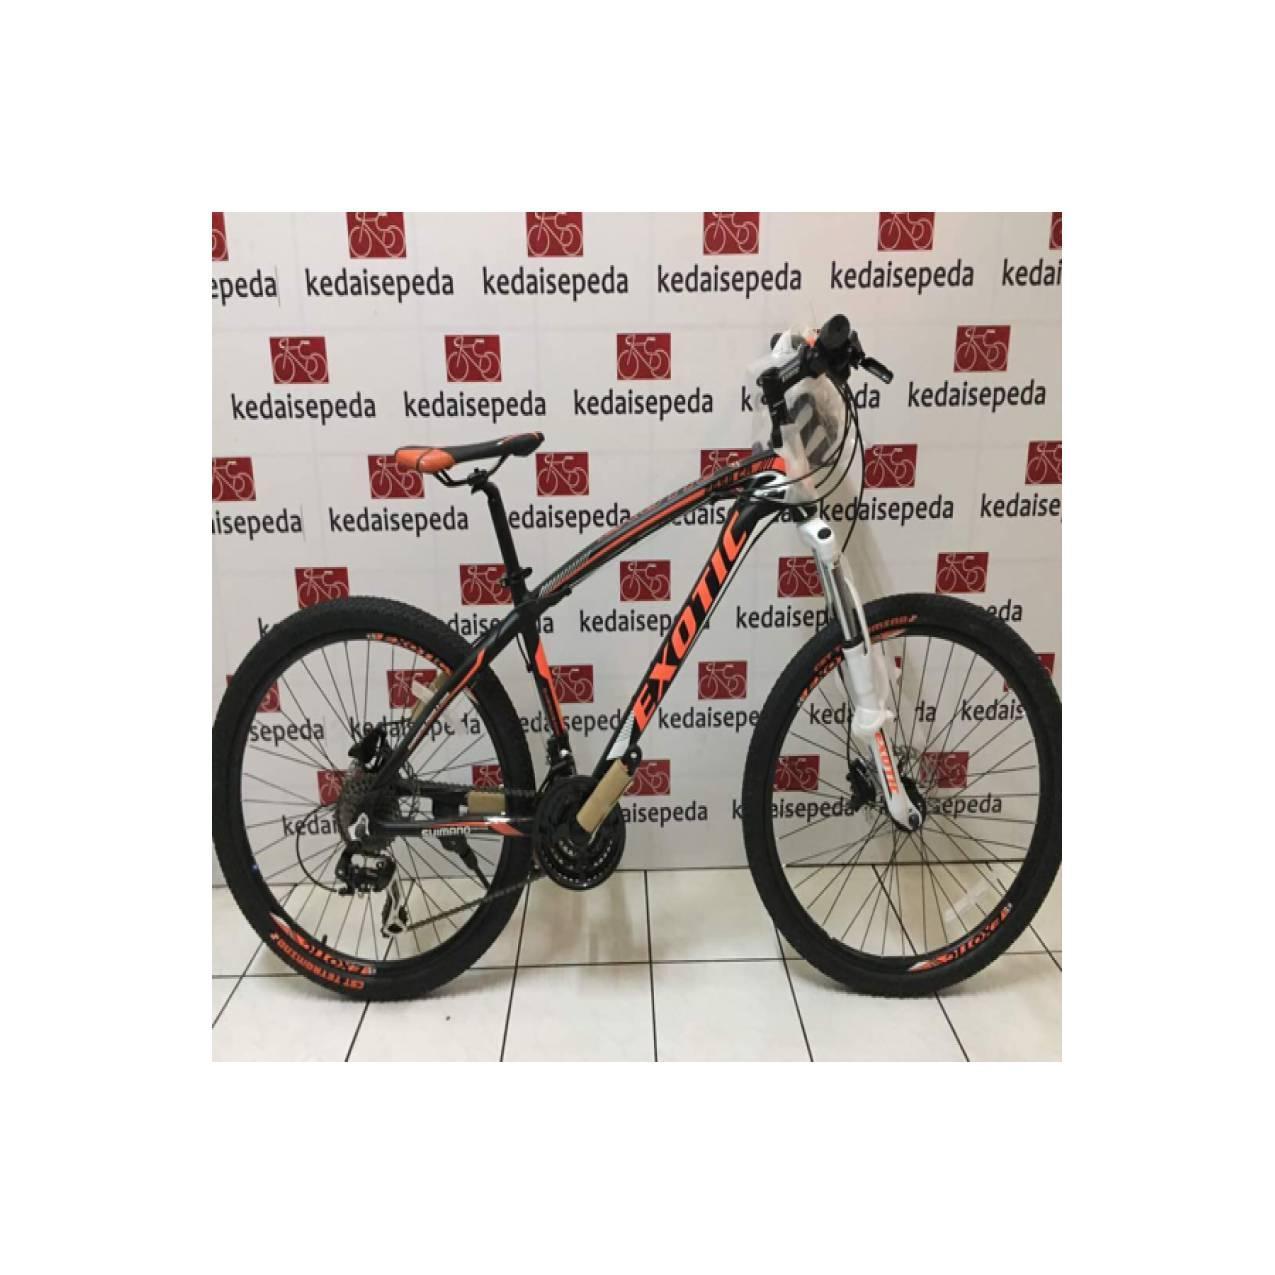 Daftar Harga Sepeda United Exotic Lengkap Dan Terbaru Cek Pompa Tangan Mini Meteran Fixie Mtb Bola 26 2658 Cr Rem Hydrolic